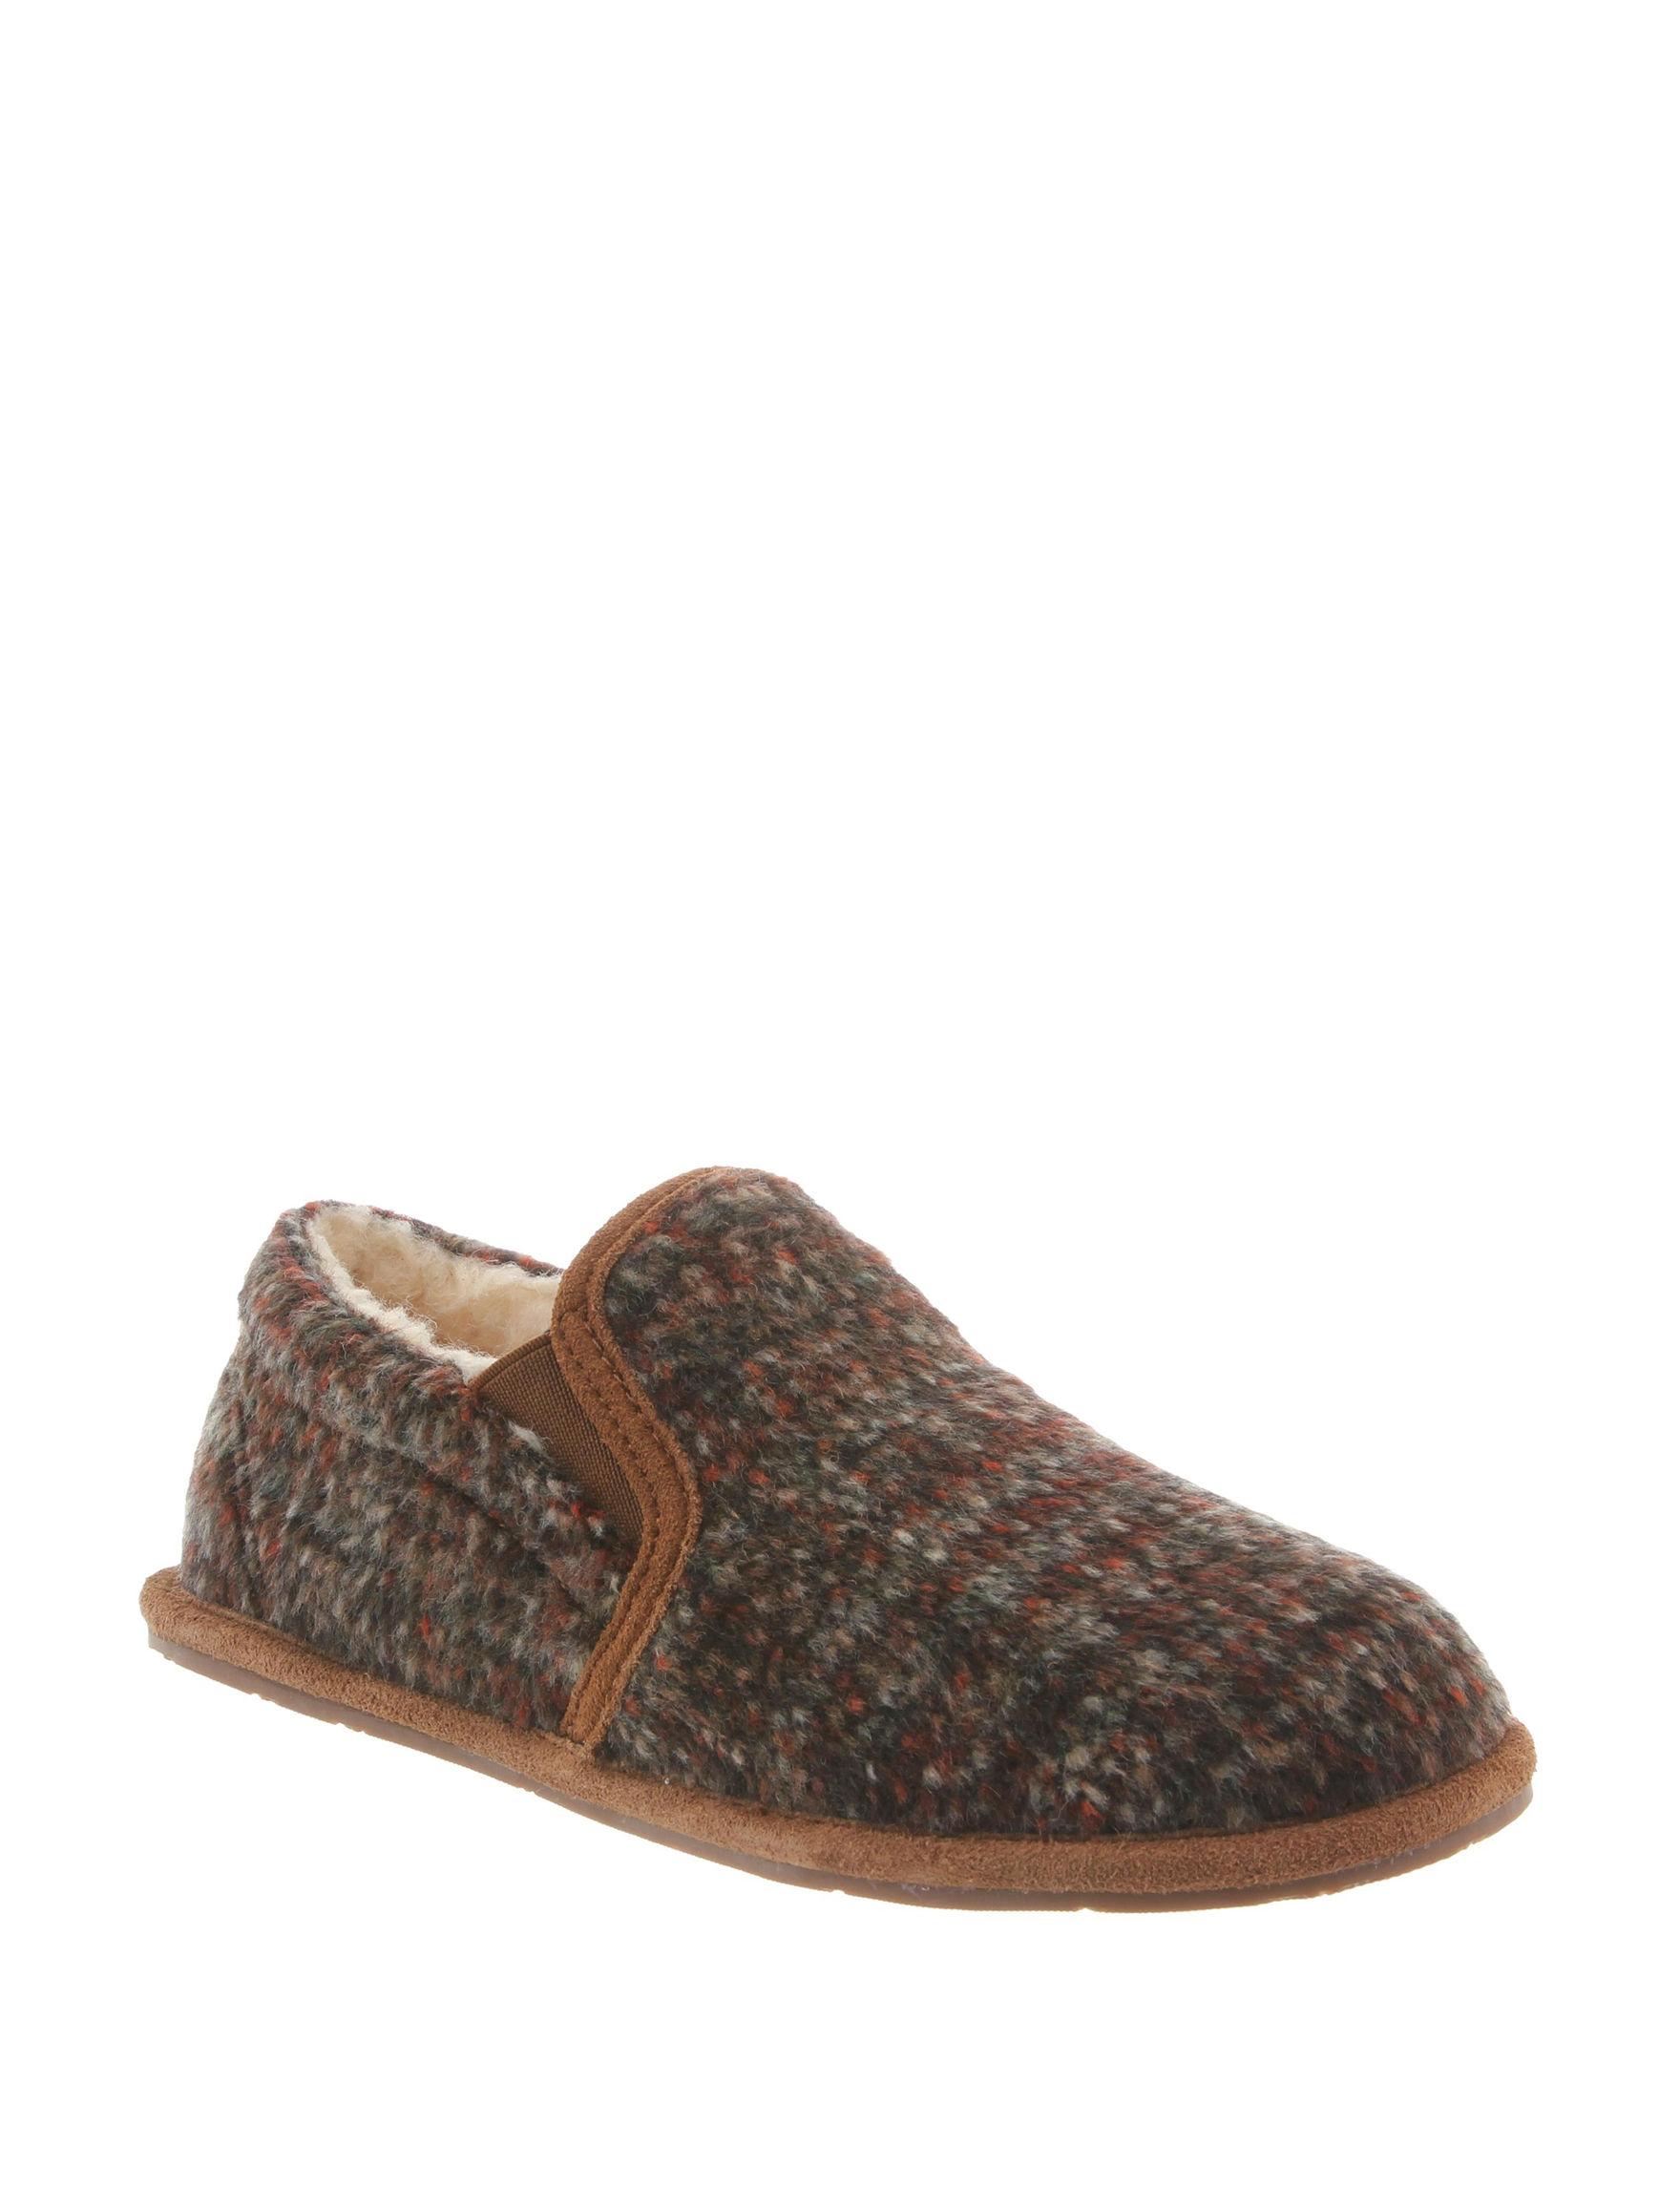 Bearpaw Brown Slipper Shoes